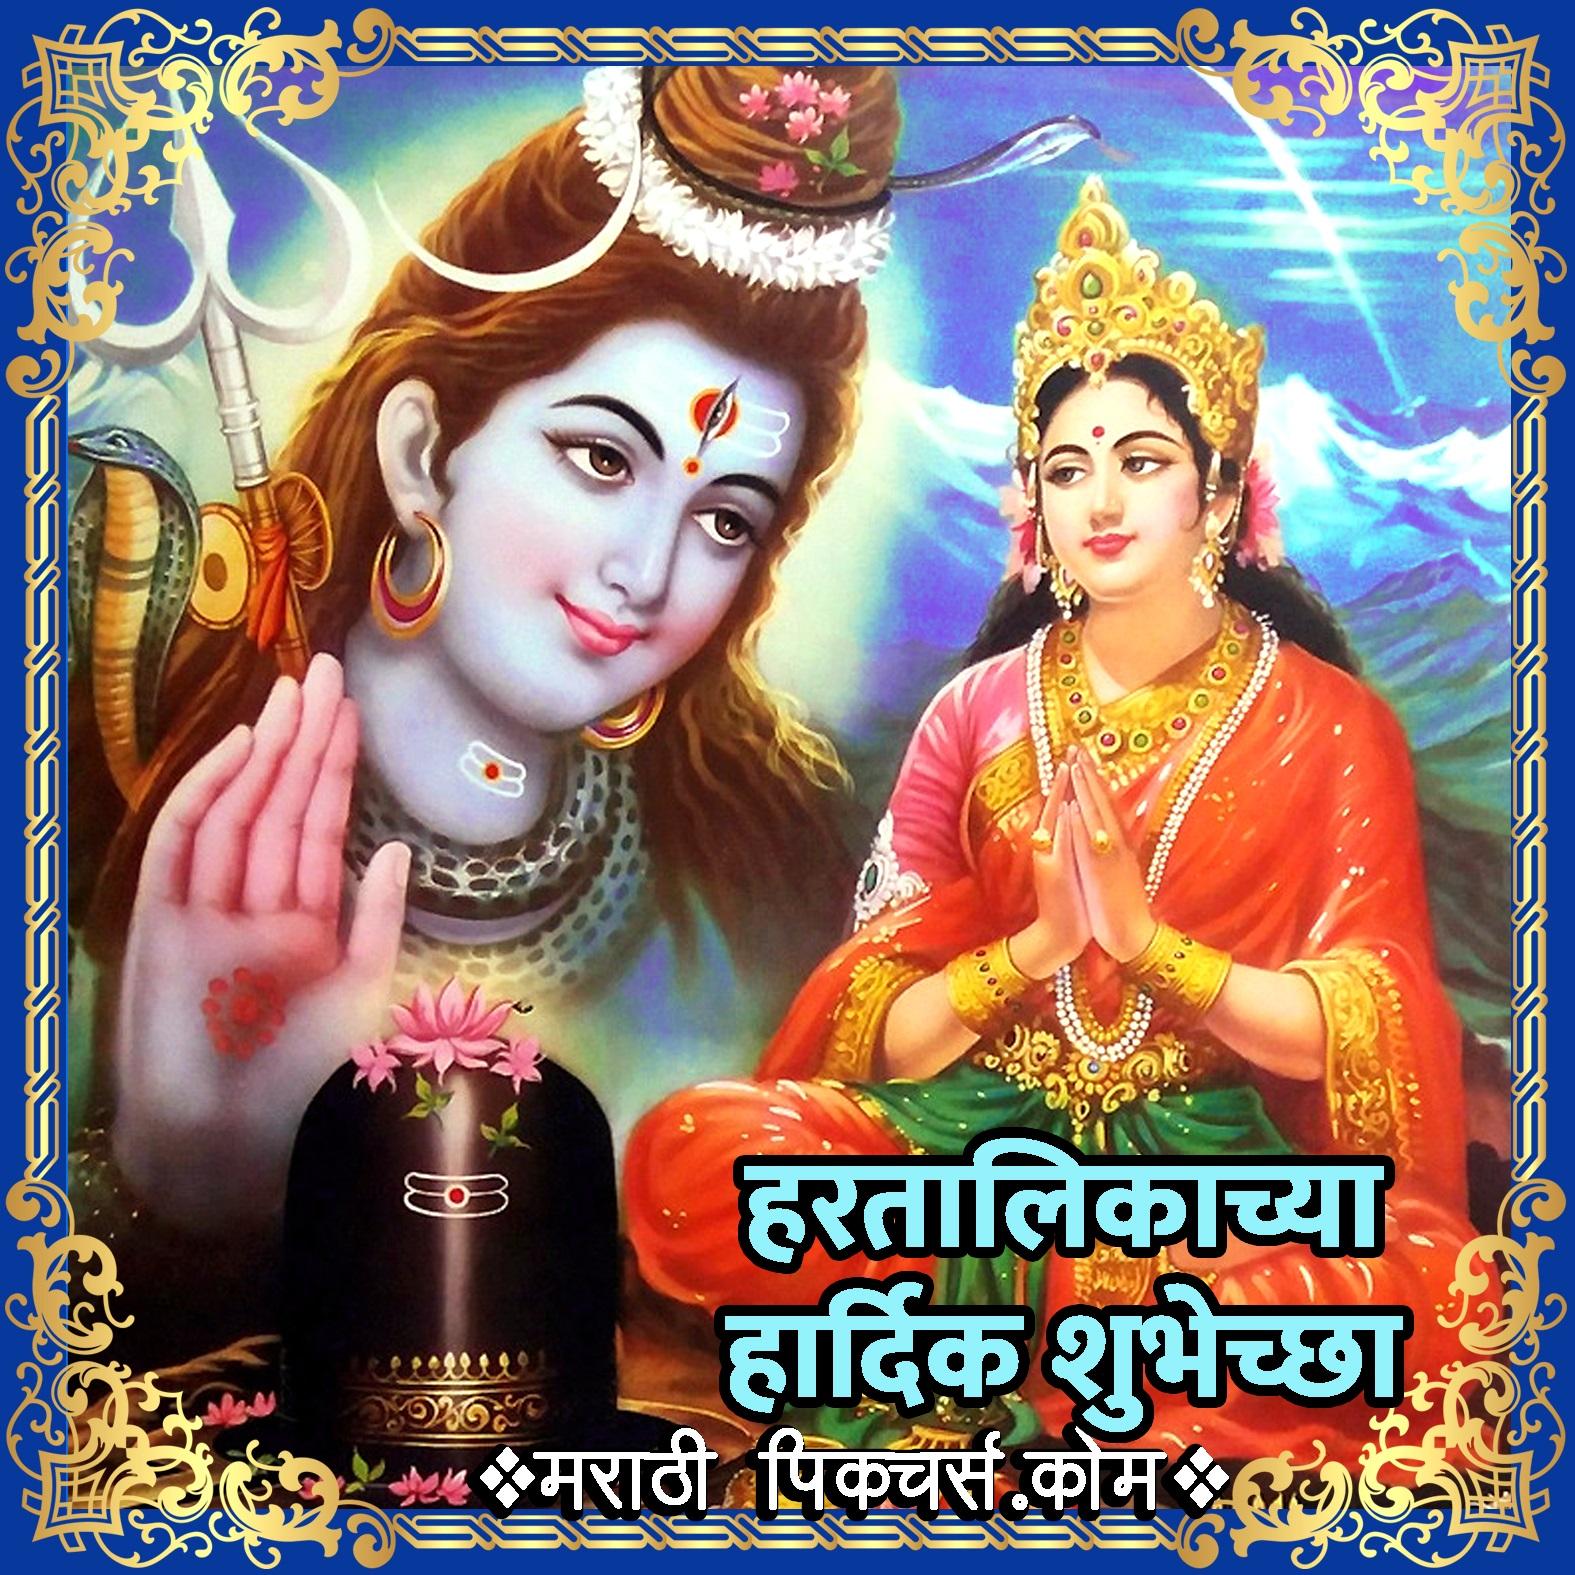 Hartalika Chya Hardik Shubhechha - Marathi Pictures ... Vadhdivas Chya Hardik Shubhechha